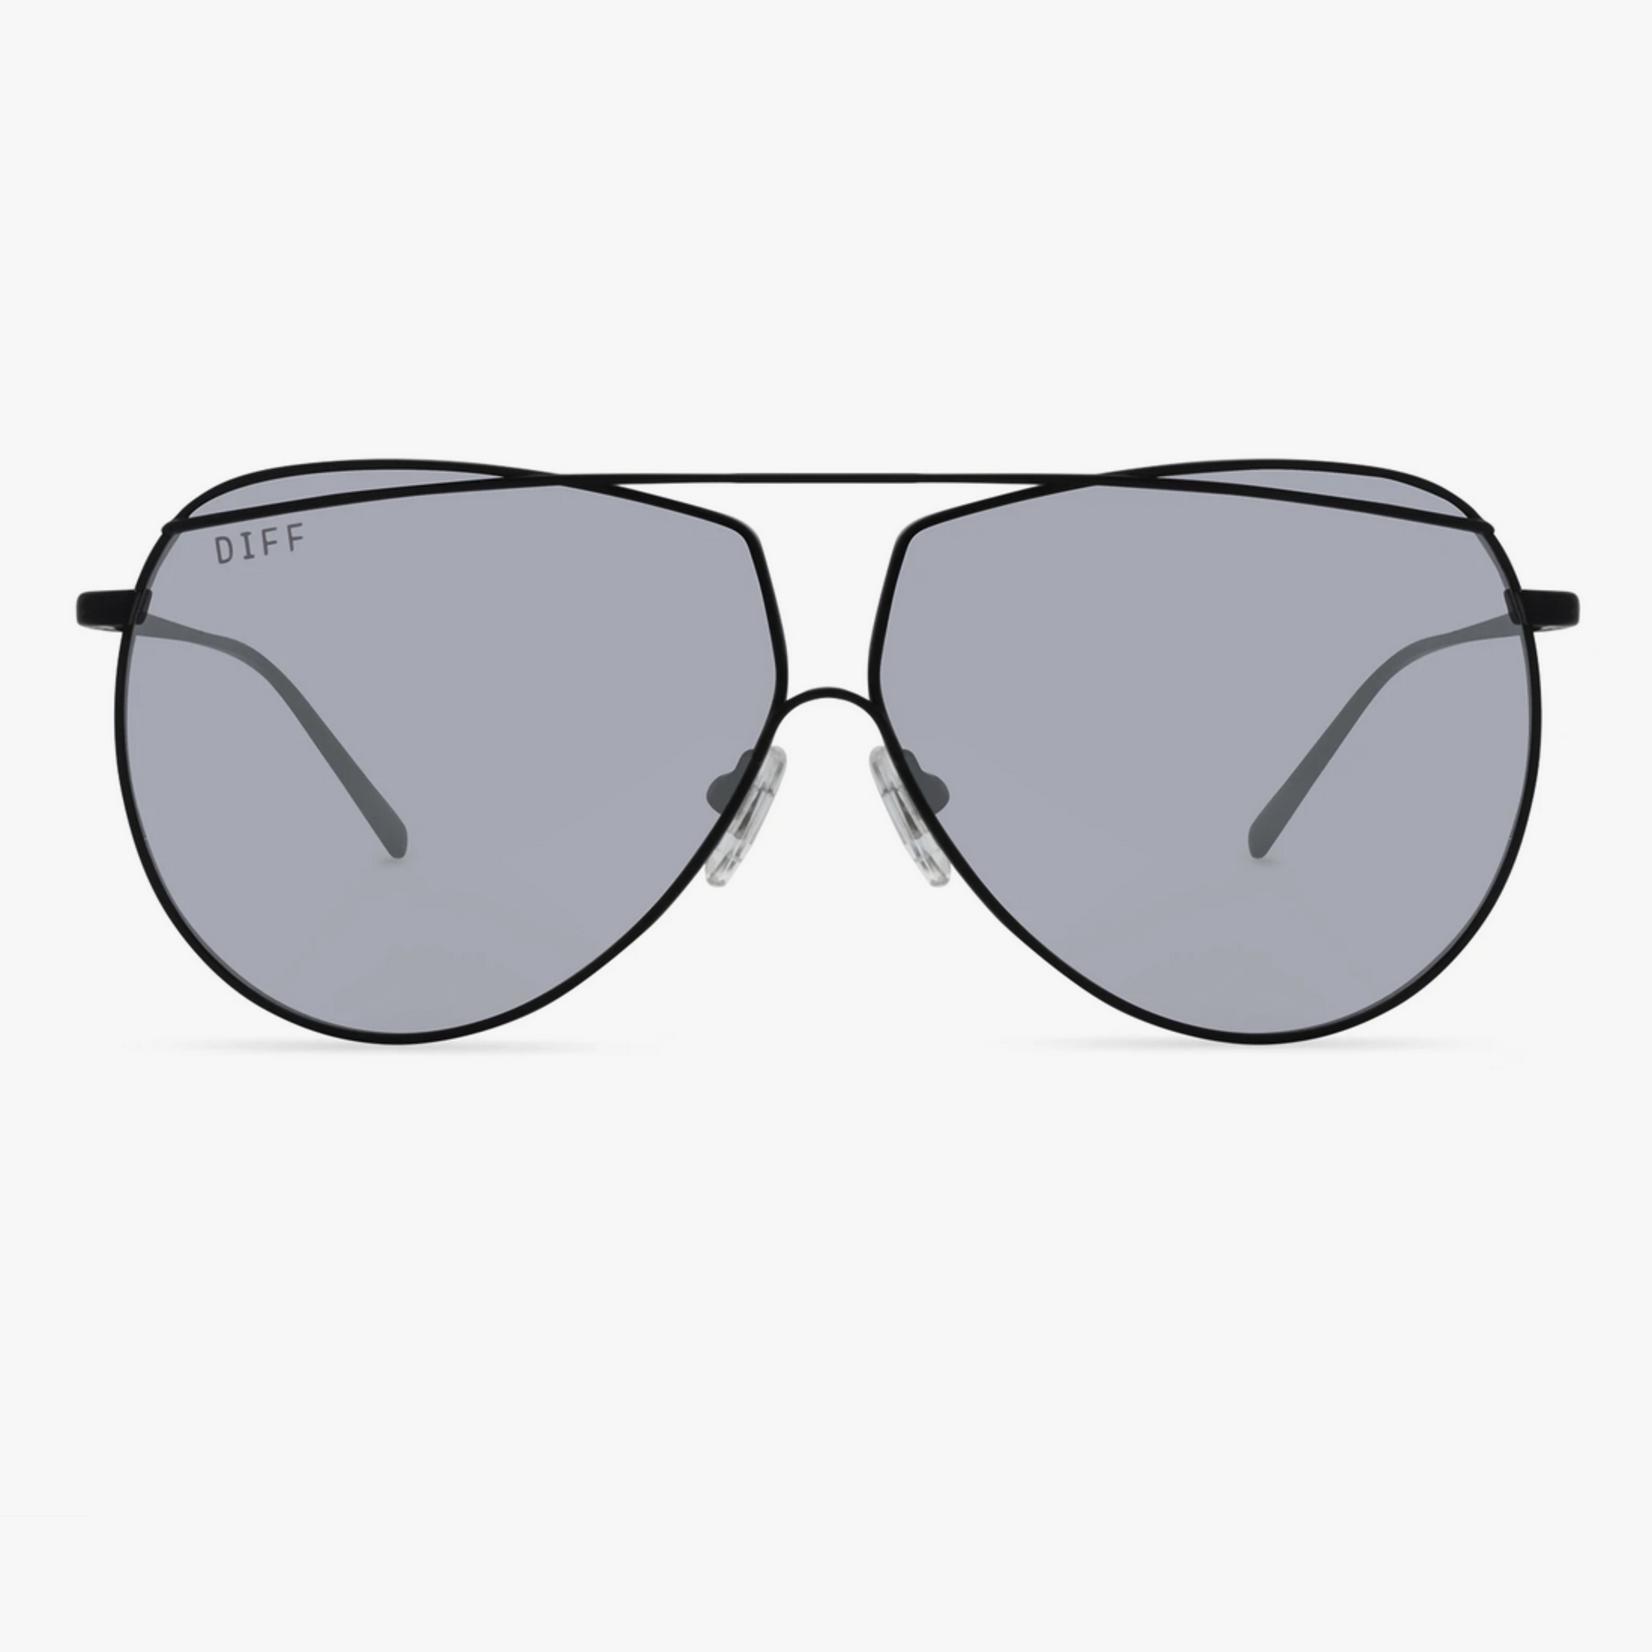 Diff - Maeve sunglasses